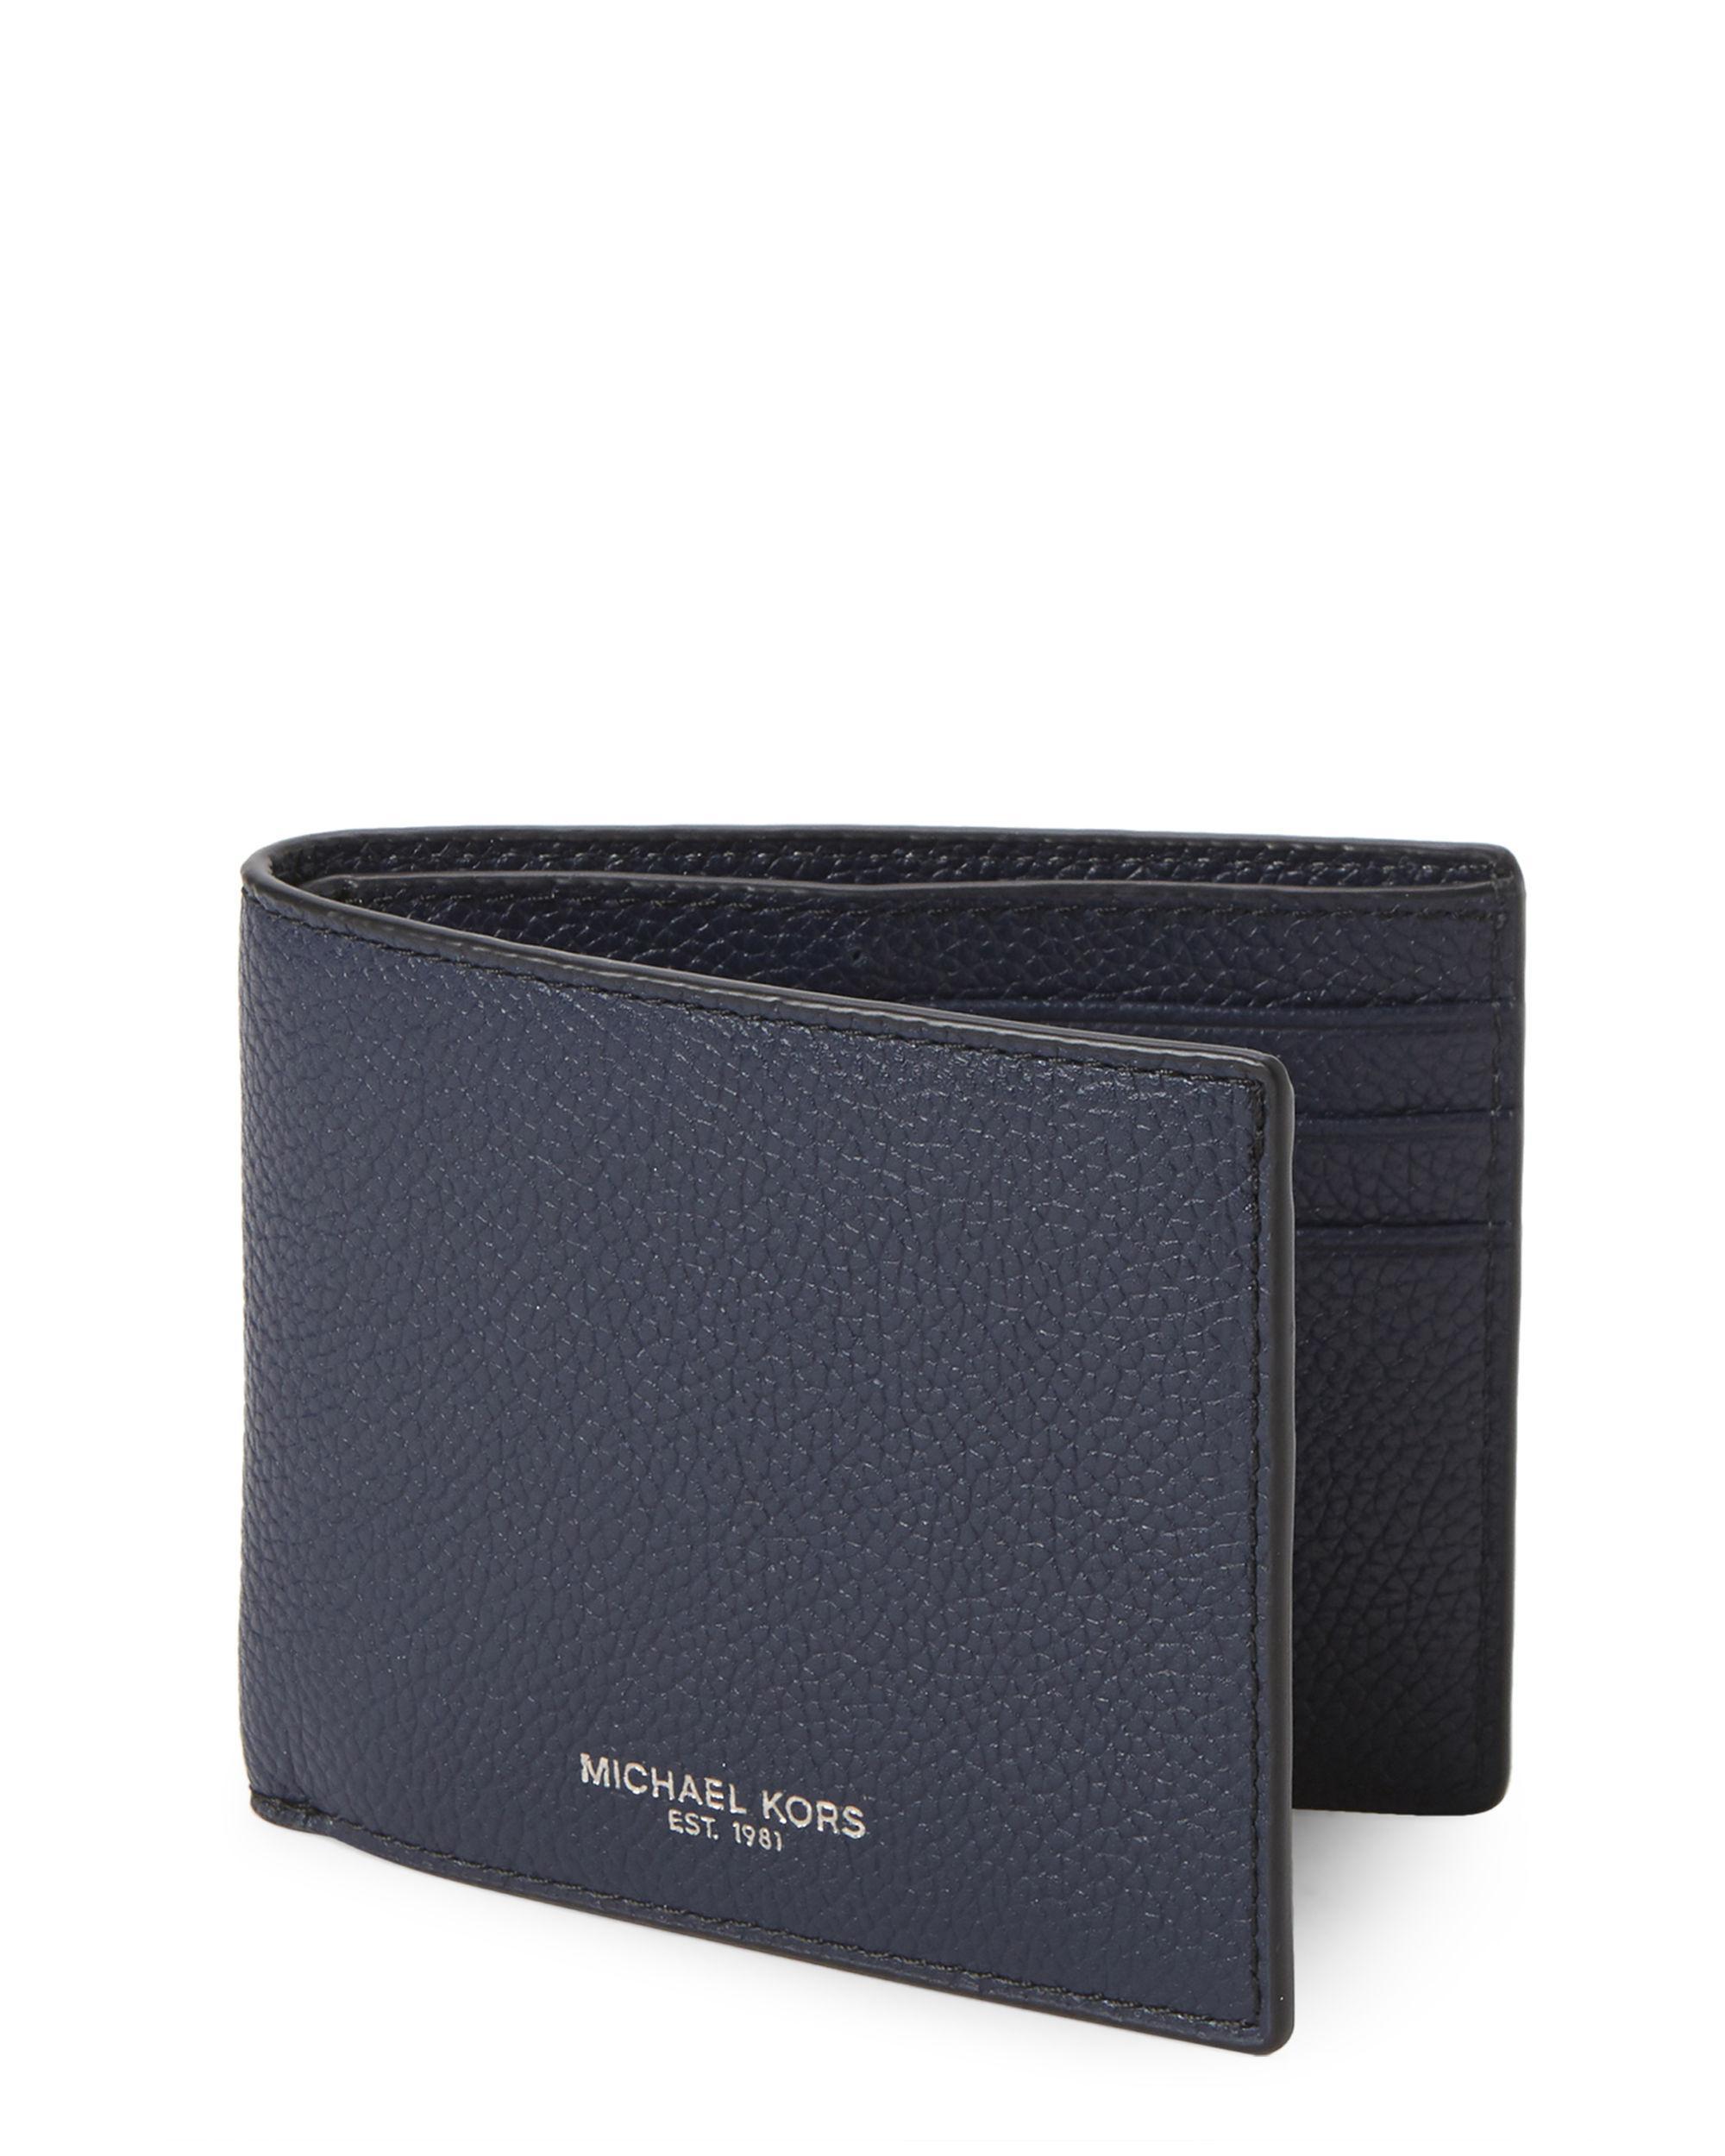 159f52341b1ed0 Lyst - Michael Kors Russel Leather Slim Billfold Wallet in Blue for Men